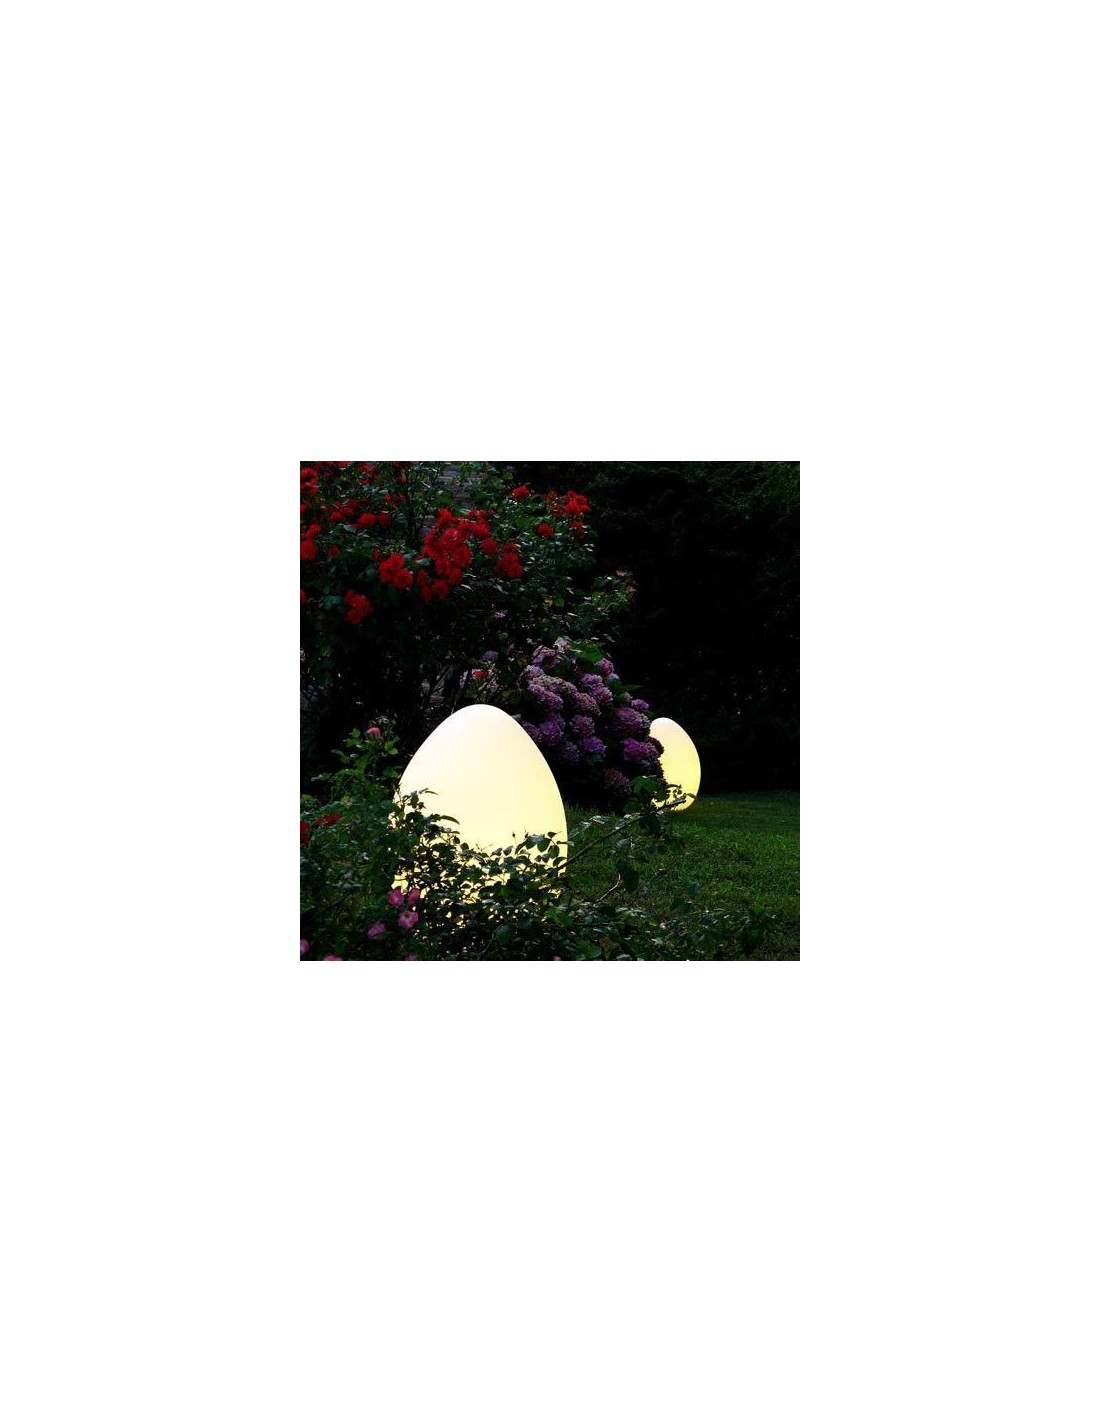 Lampe Uovo extérieur fontana arte mise en scène dans un jardin